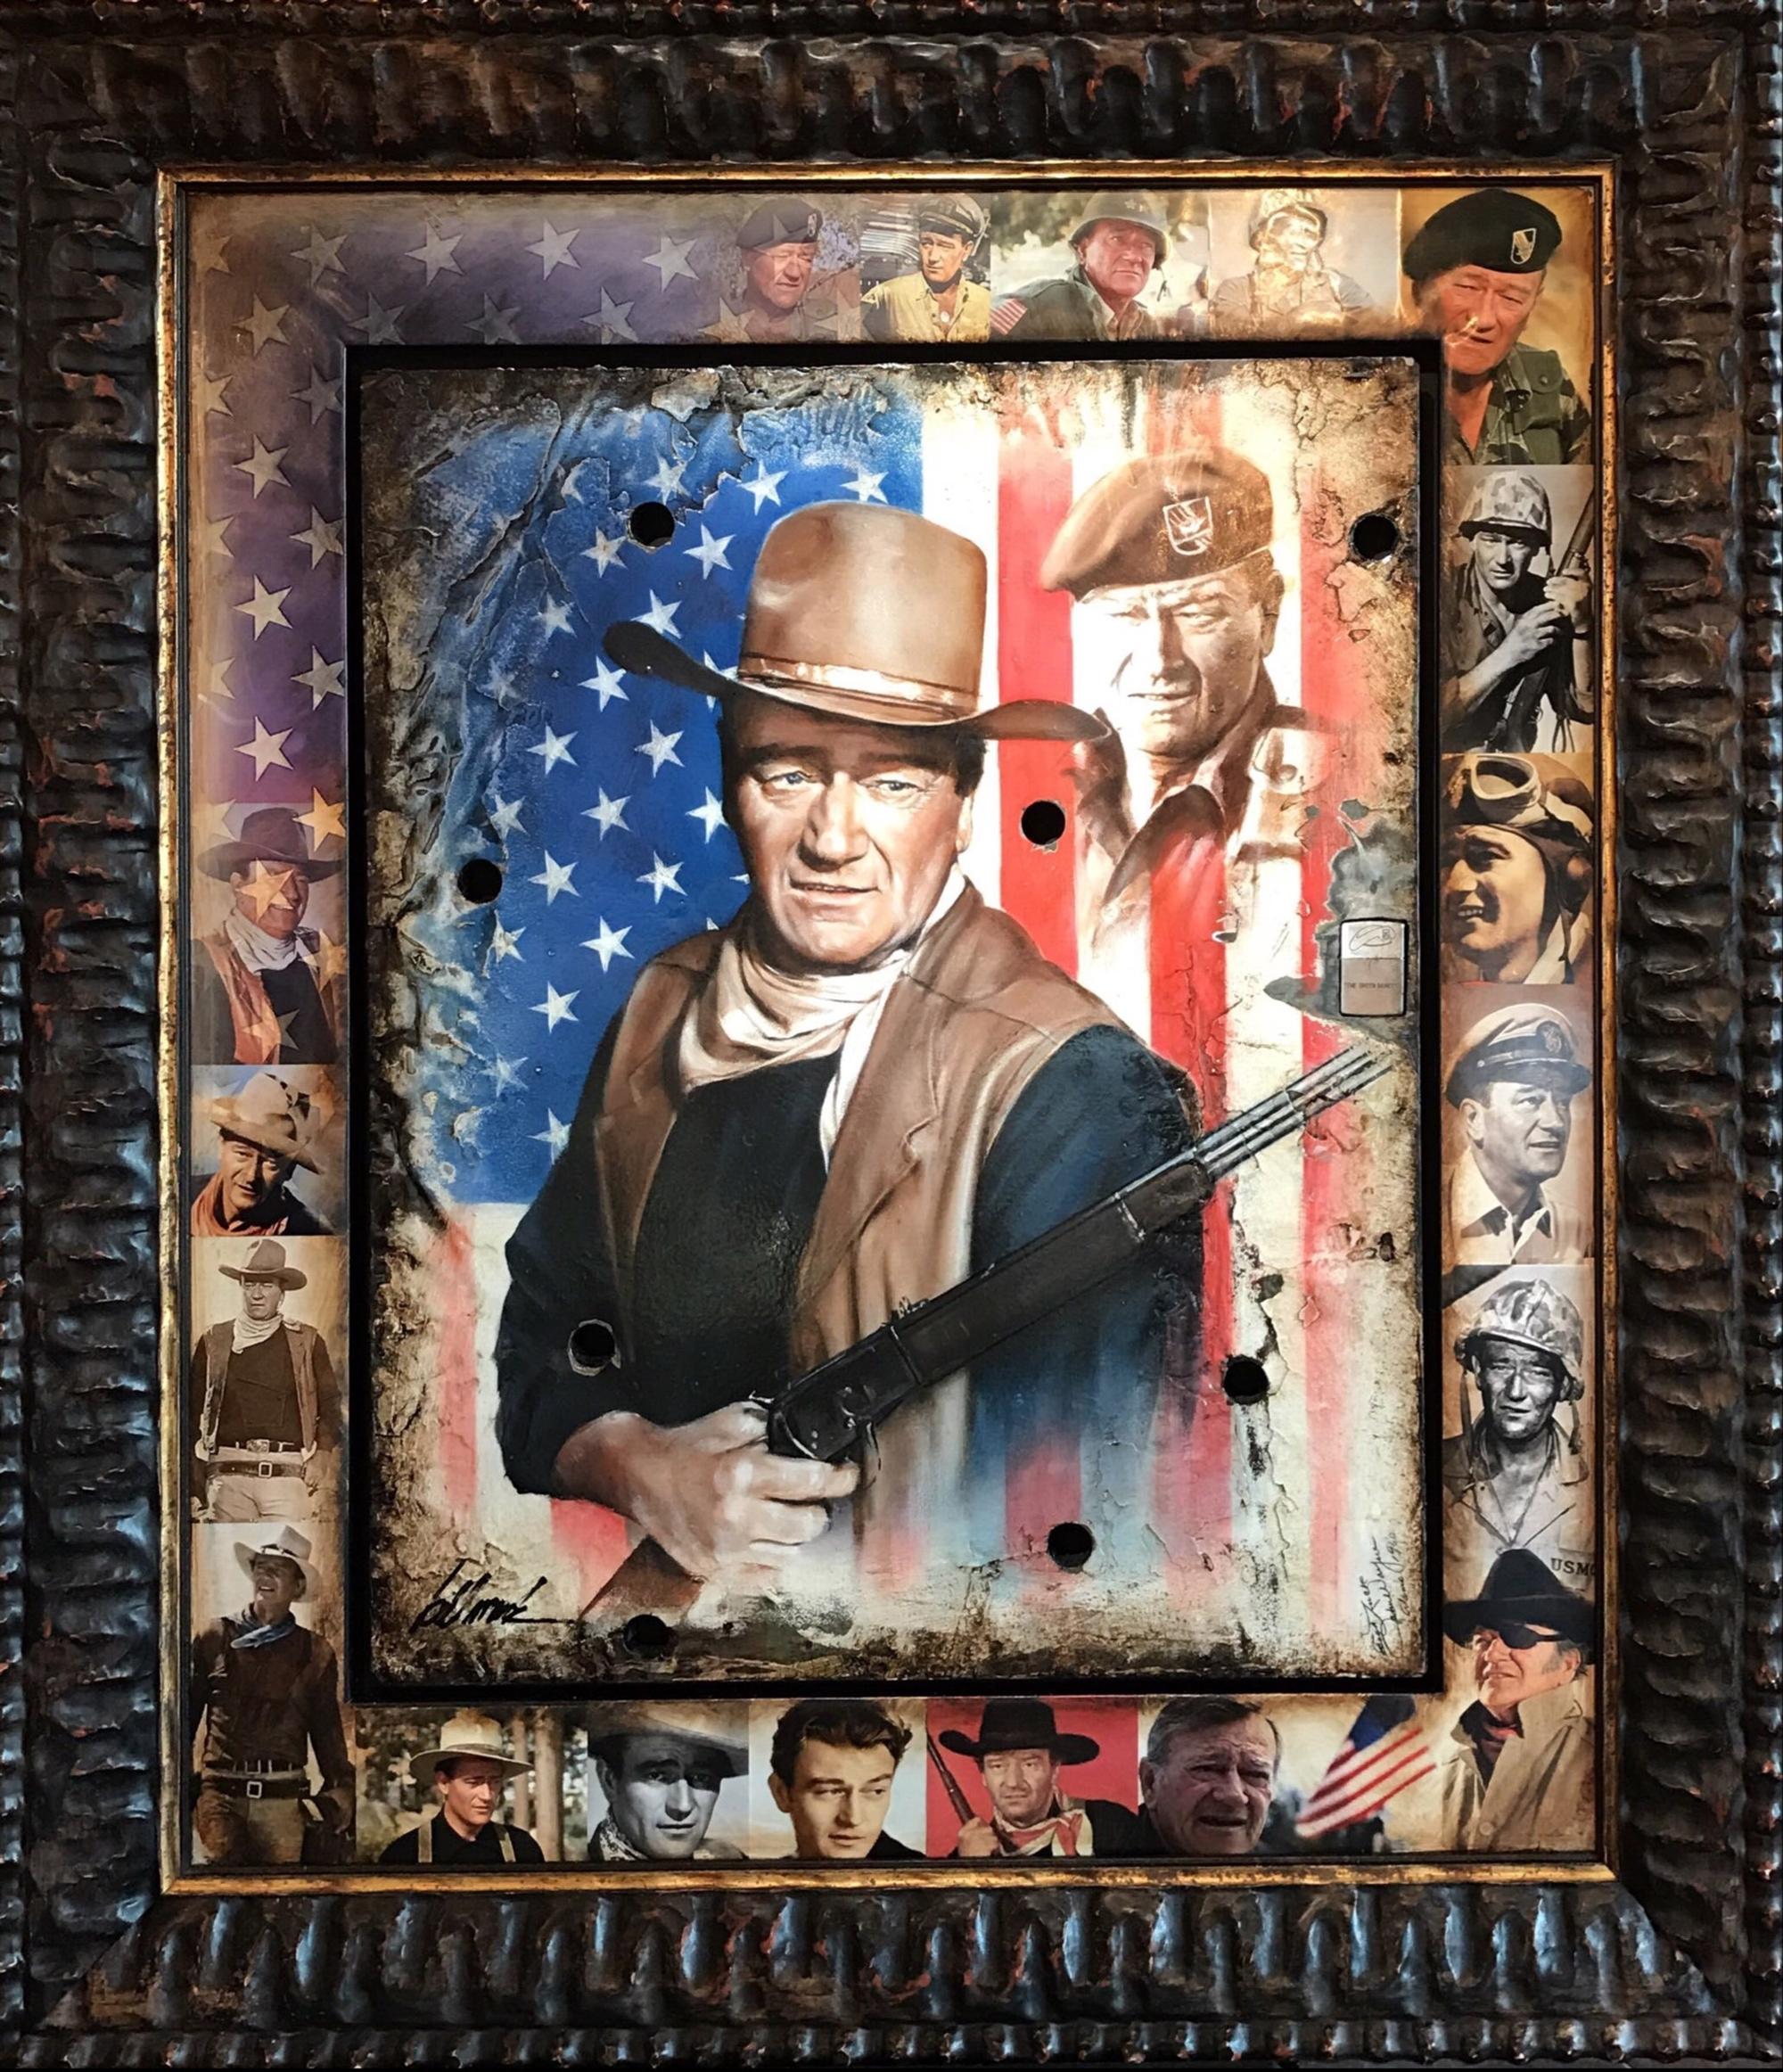 John Wayne with Lighter by Bill Mack Hollywood Sign